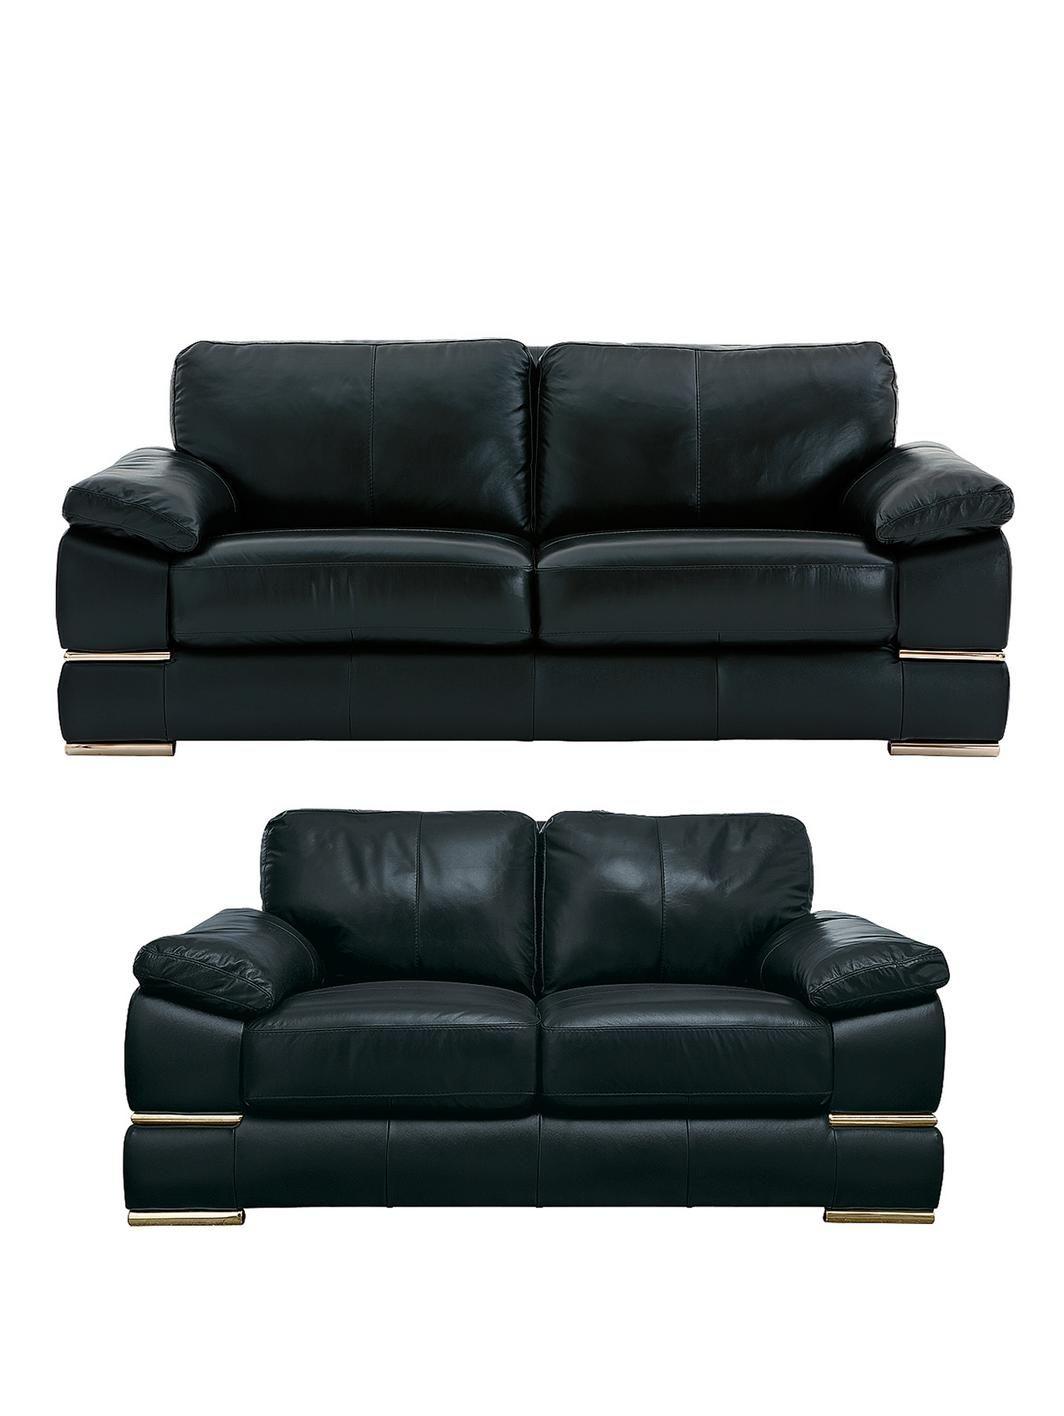 Primo Italian Leather 3 Seater 2